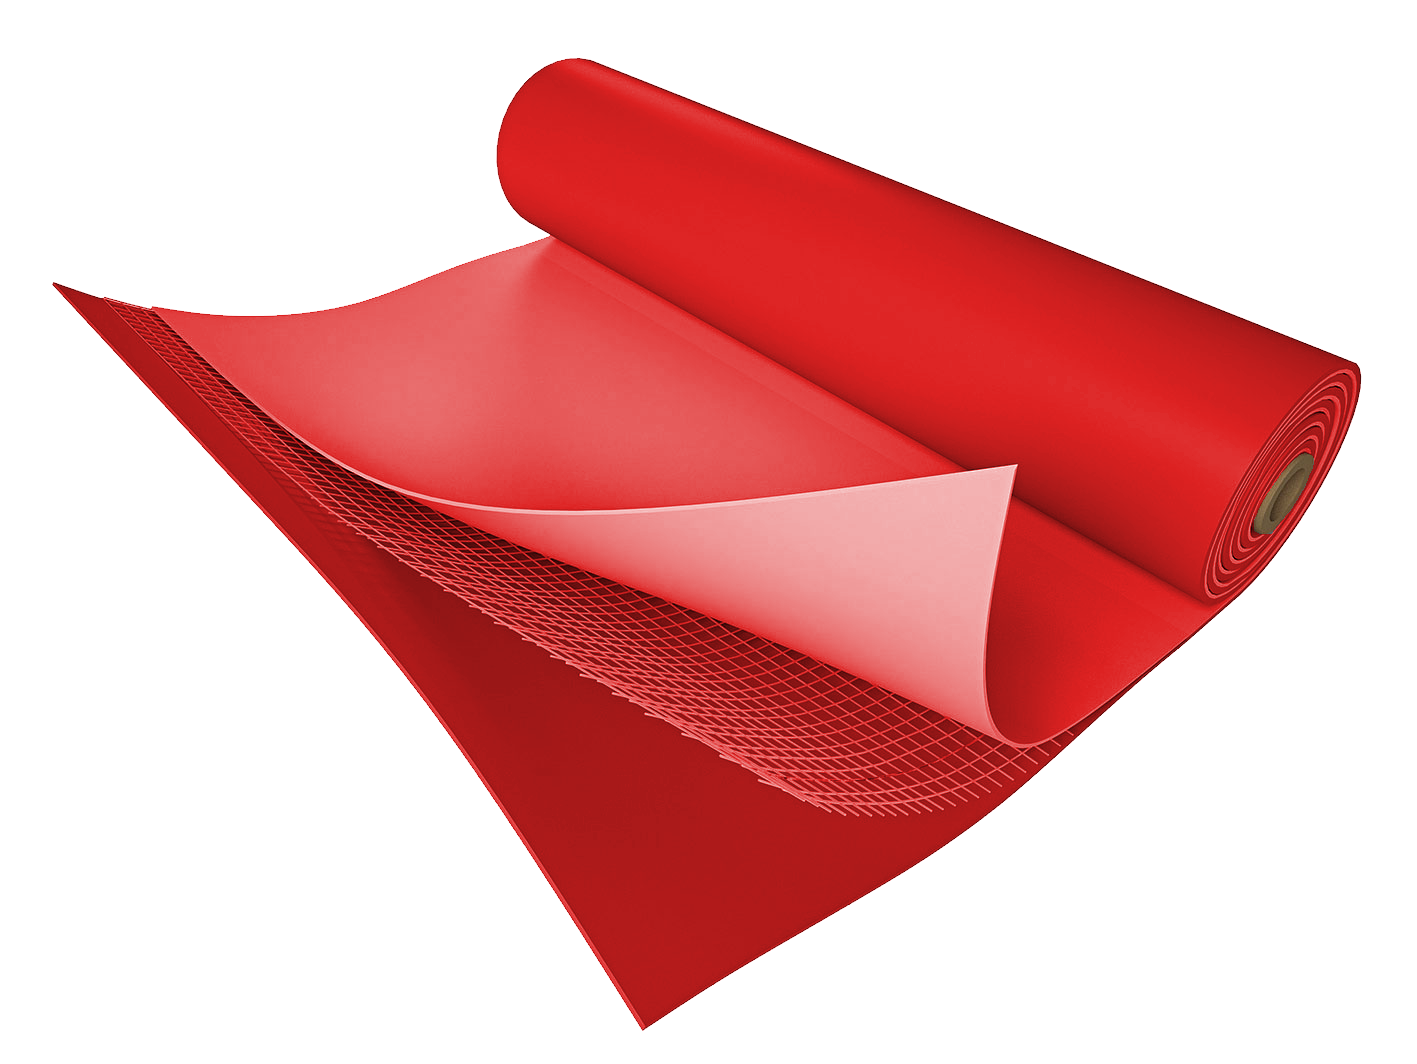 detalii tehnice material prelata